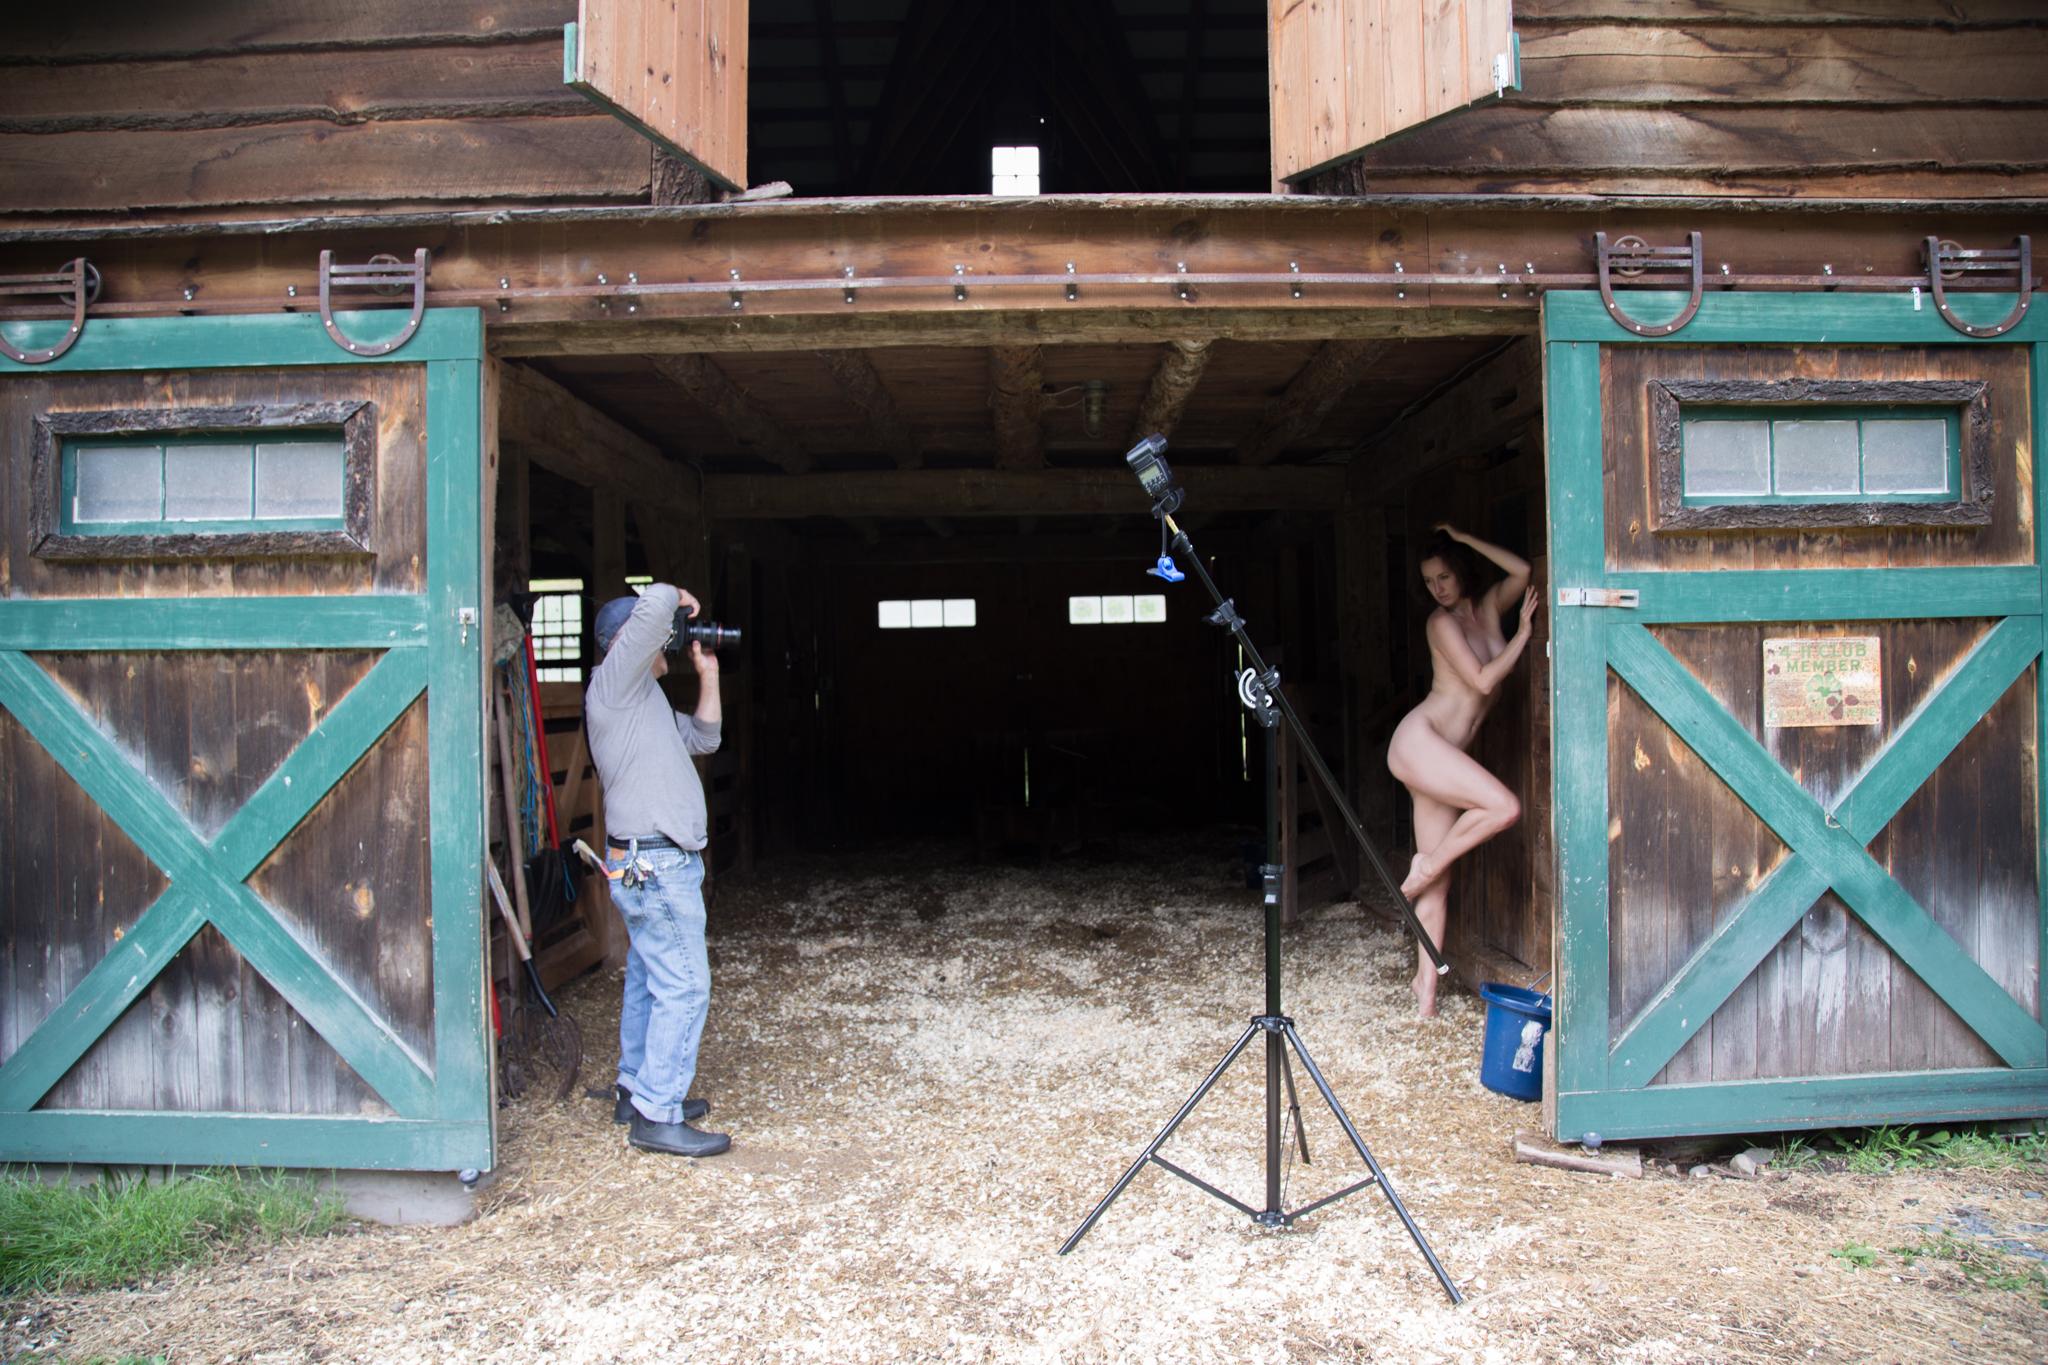 Holz-Weston-Nude-Workshop-2017-47-by-Annabelle-Scott.jpg